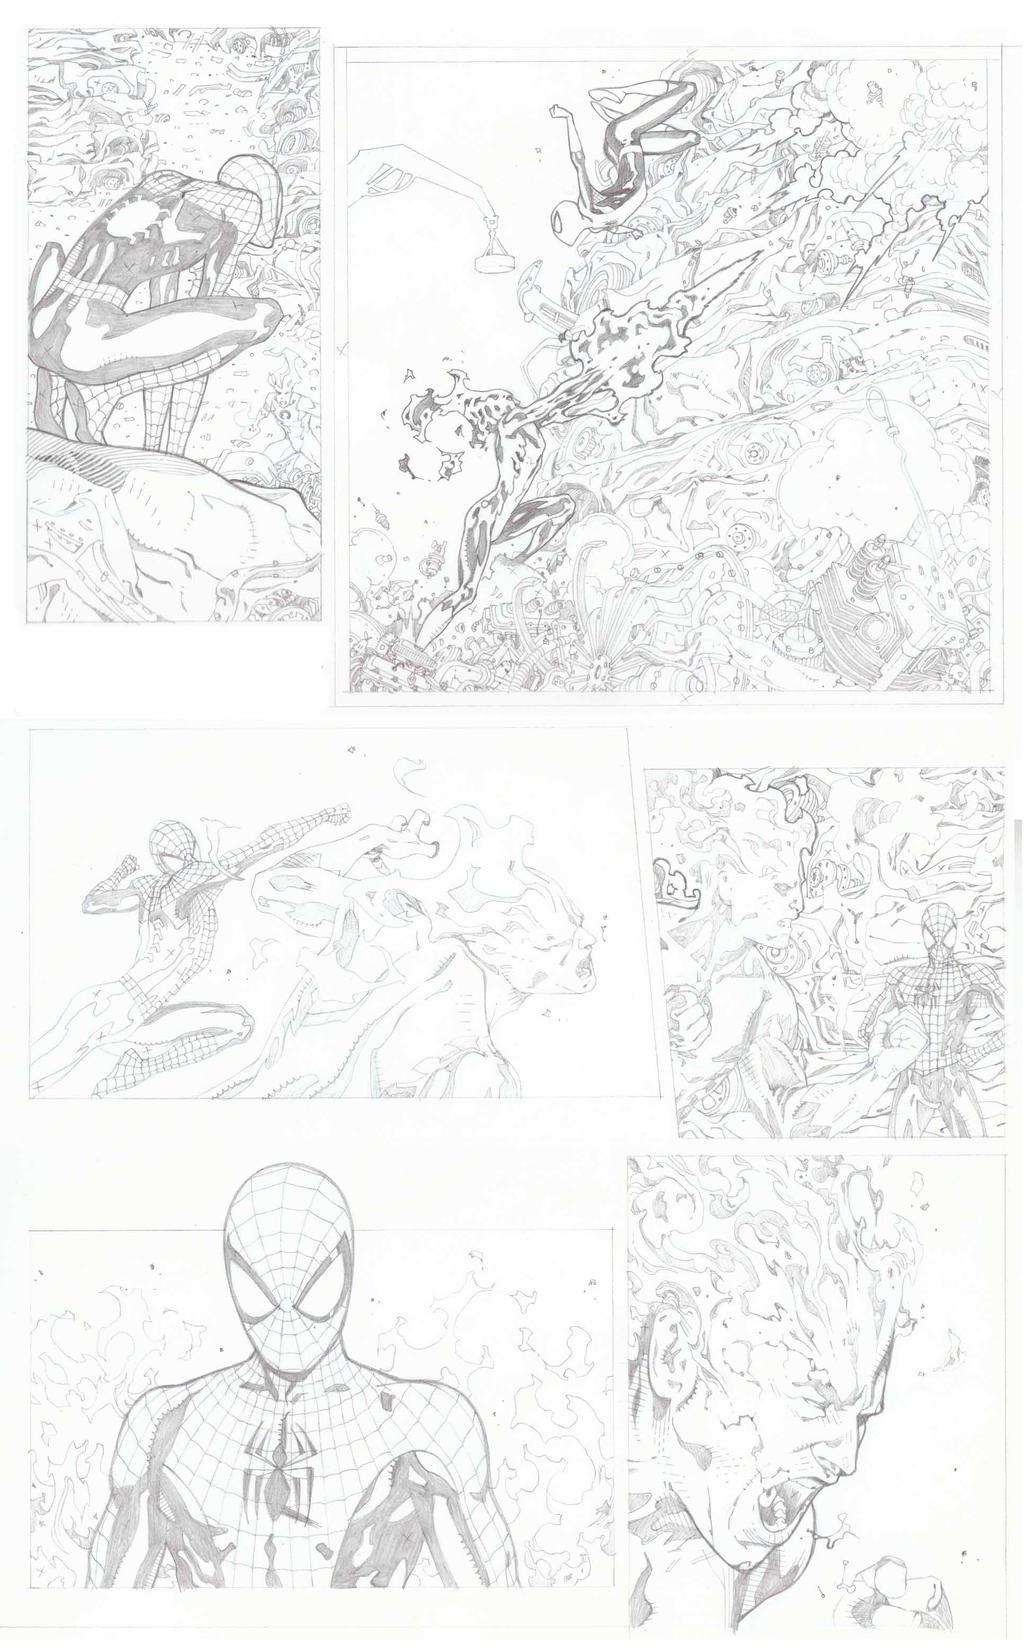 Spiderman 700.3 Pencils Pg 3 by timothygreenII